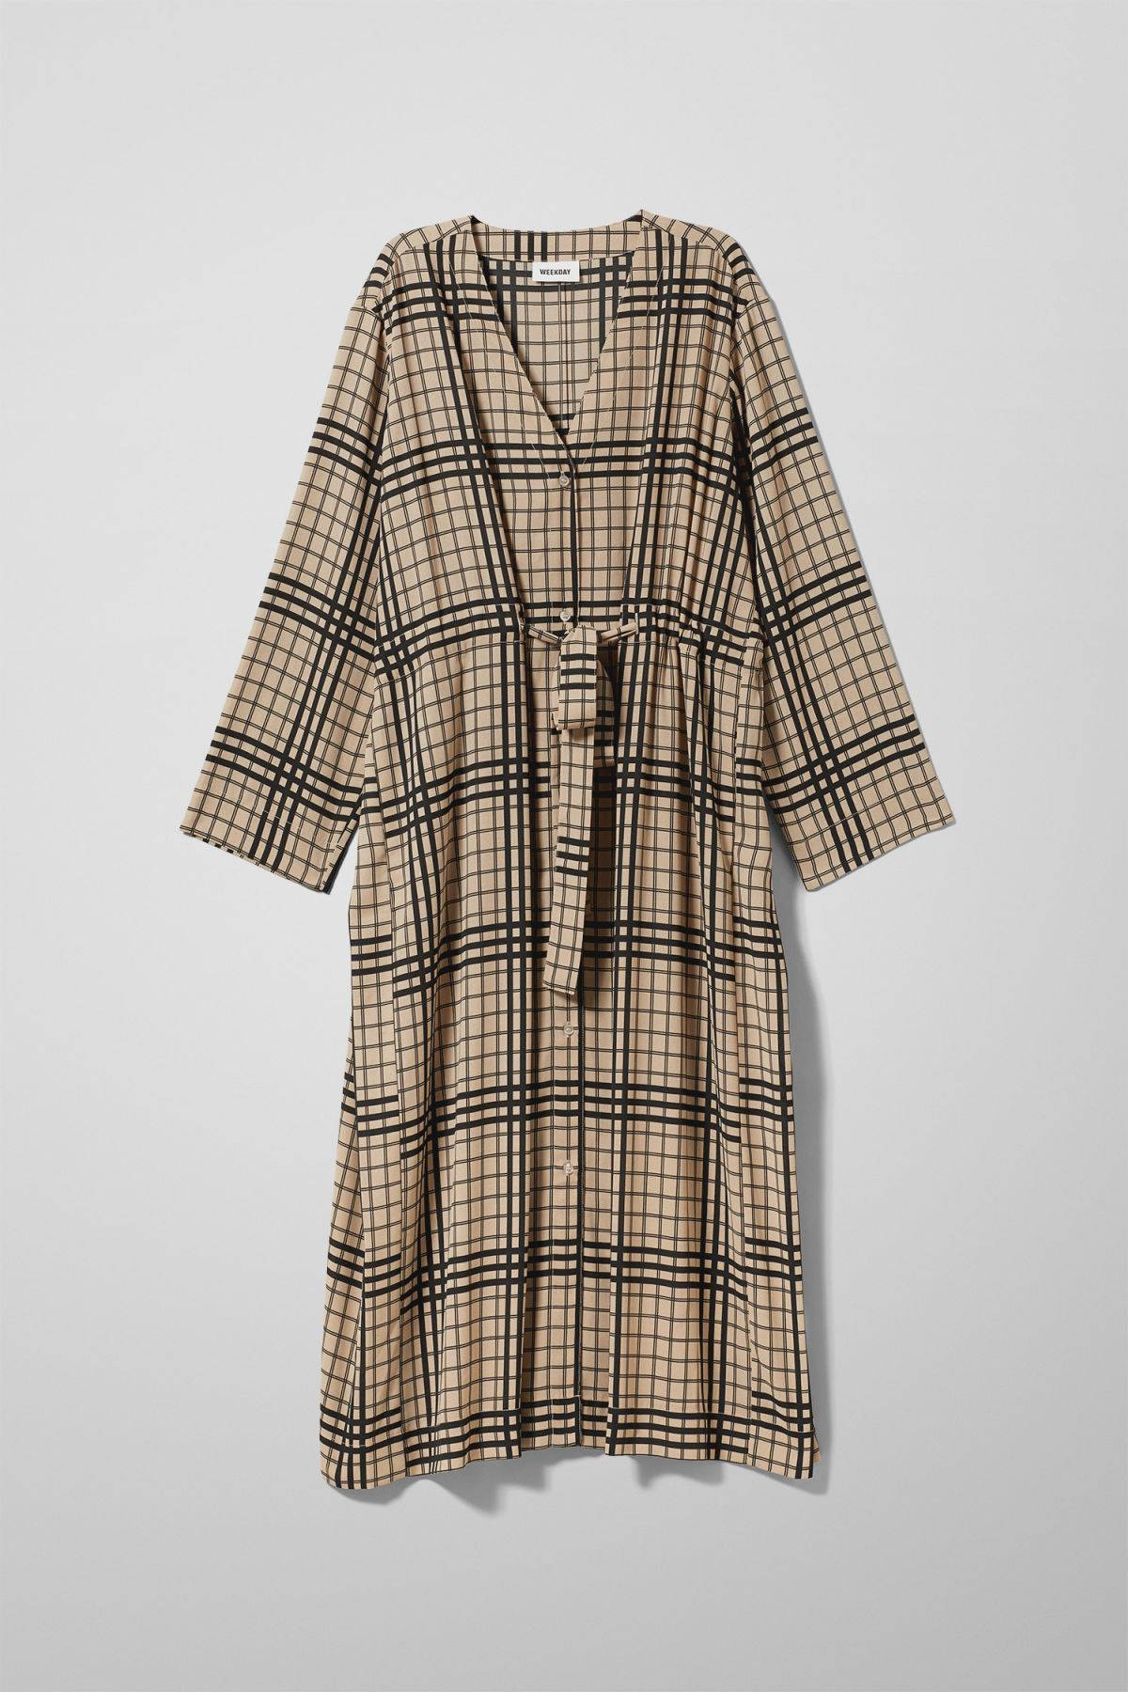 Image of Chalk Long Sleeve Dress - Beige-M